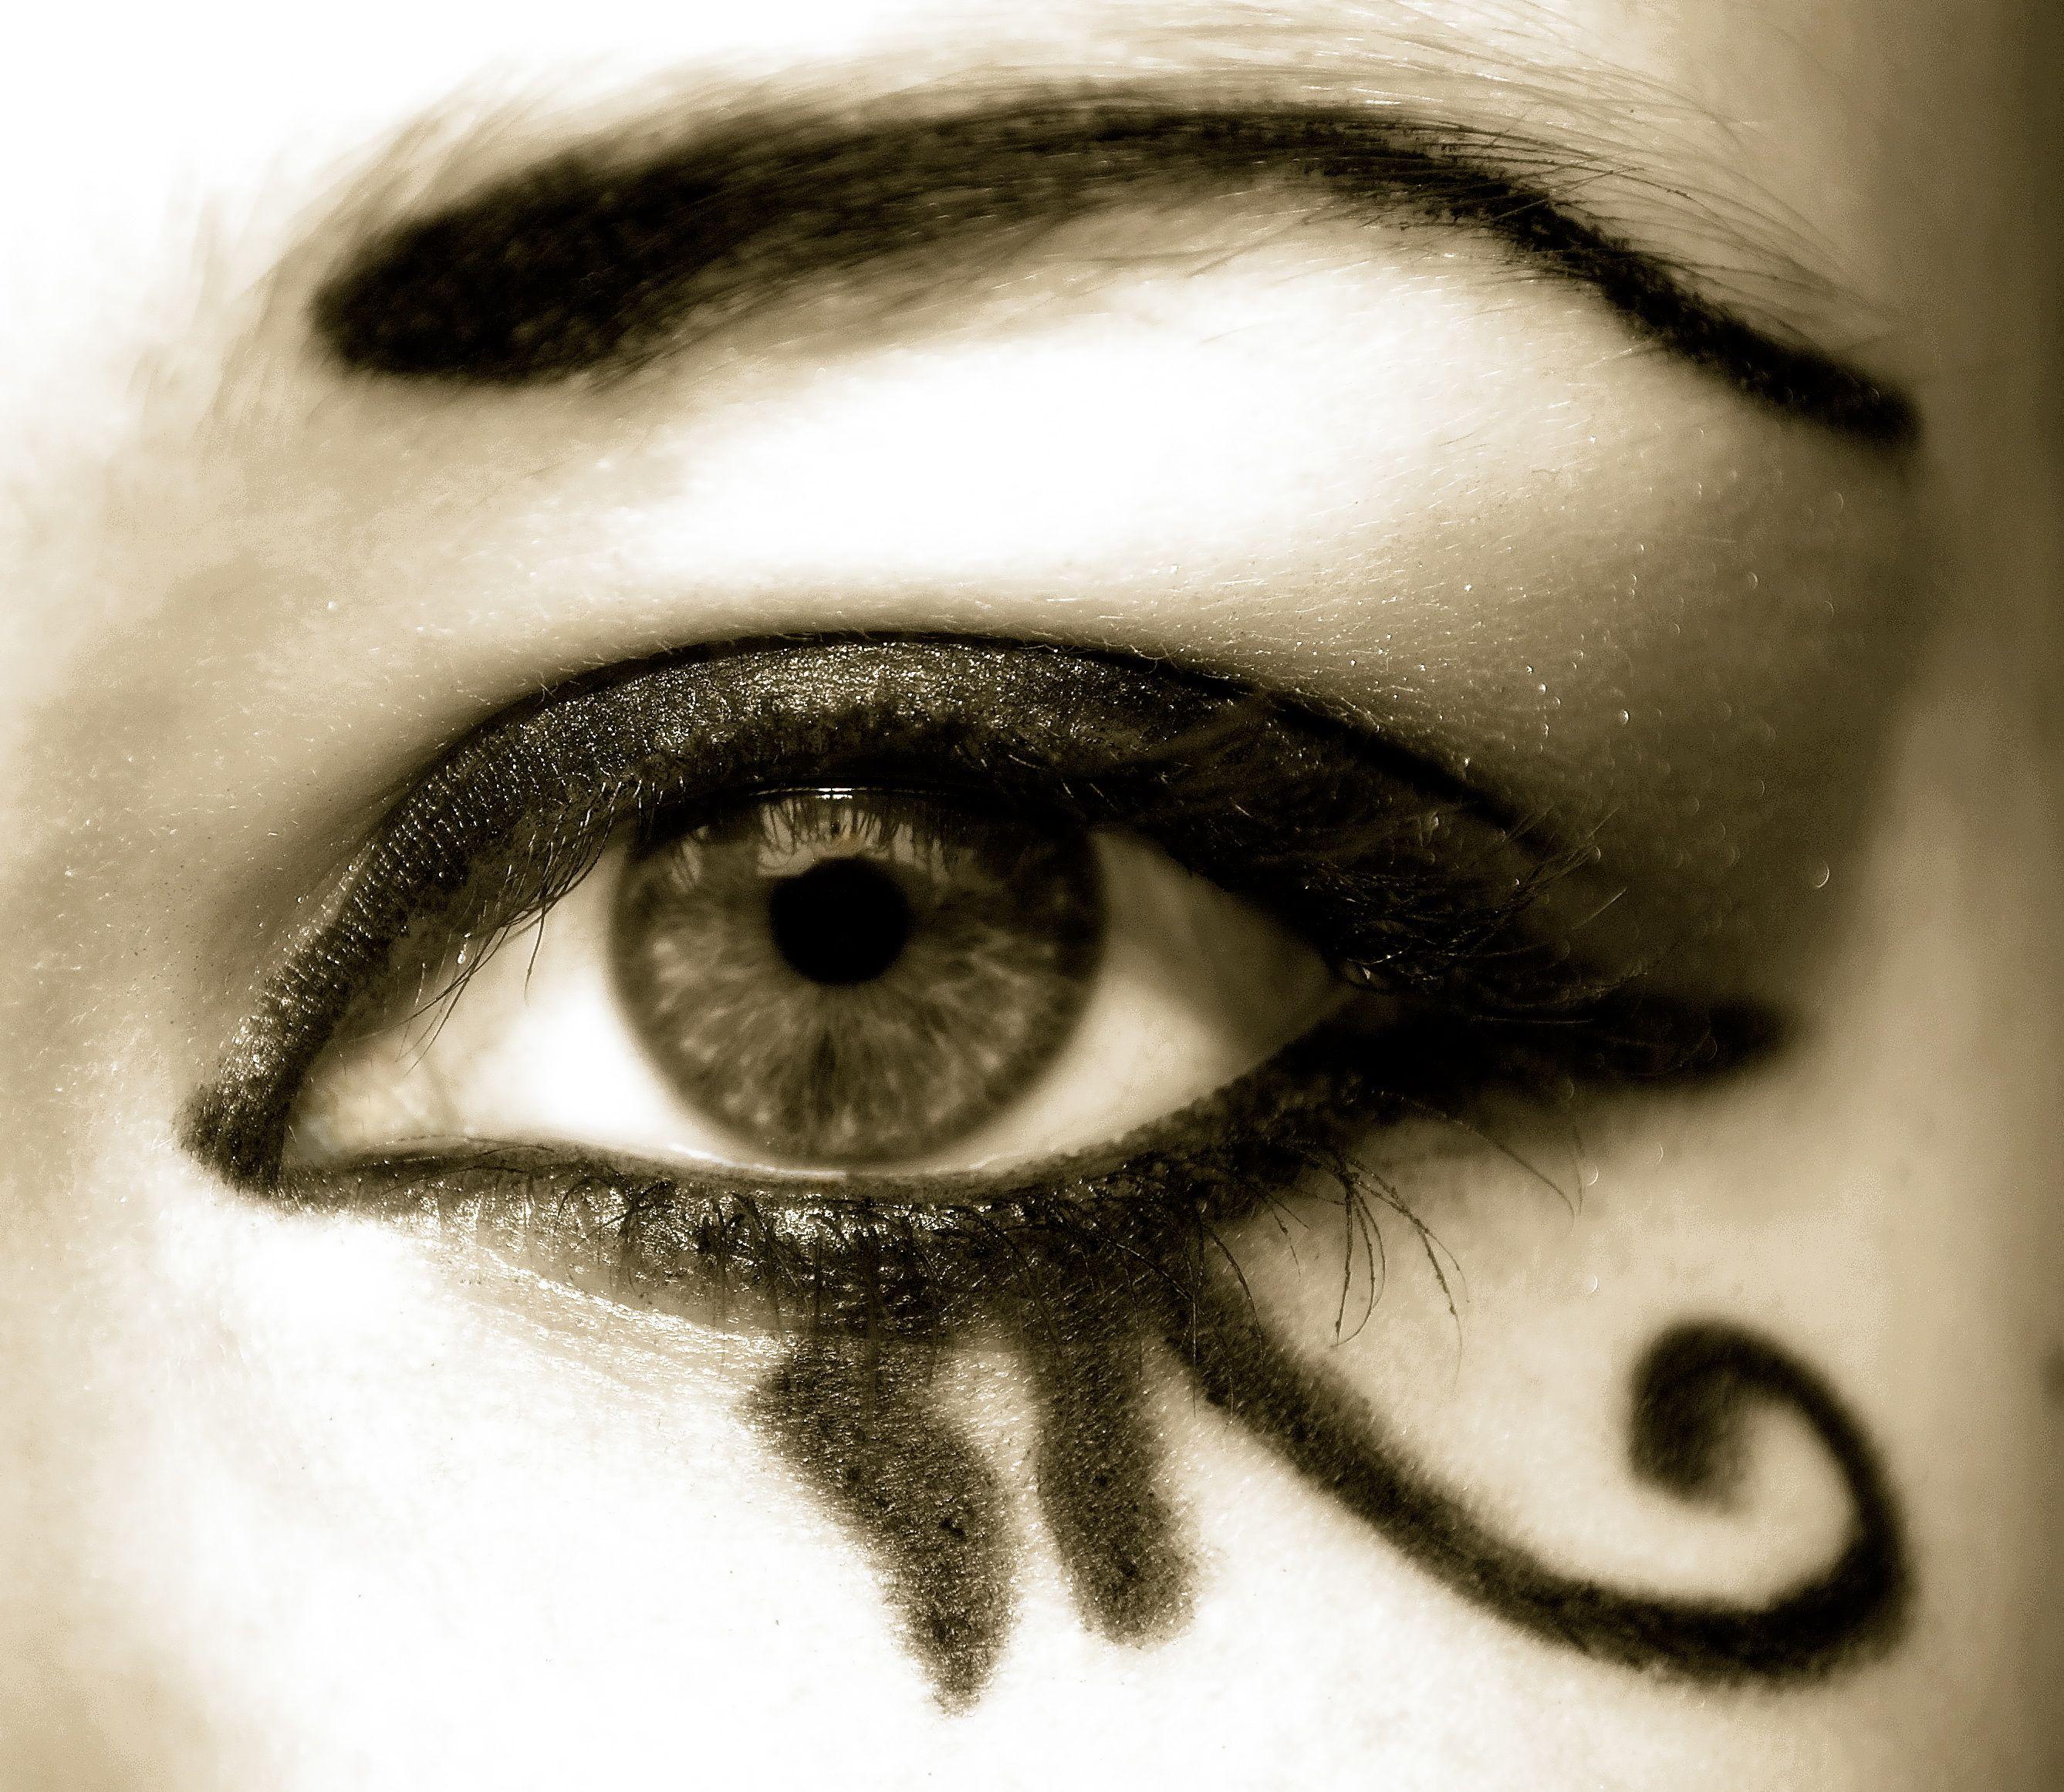 Egyptian Eye Of Horus Makeup | www.pixshark.com - Images ...